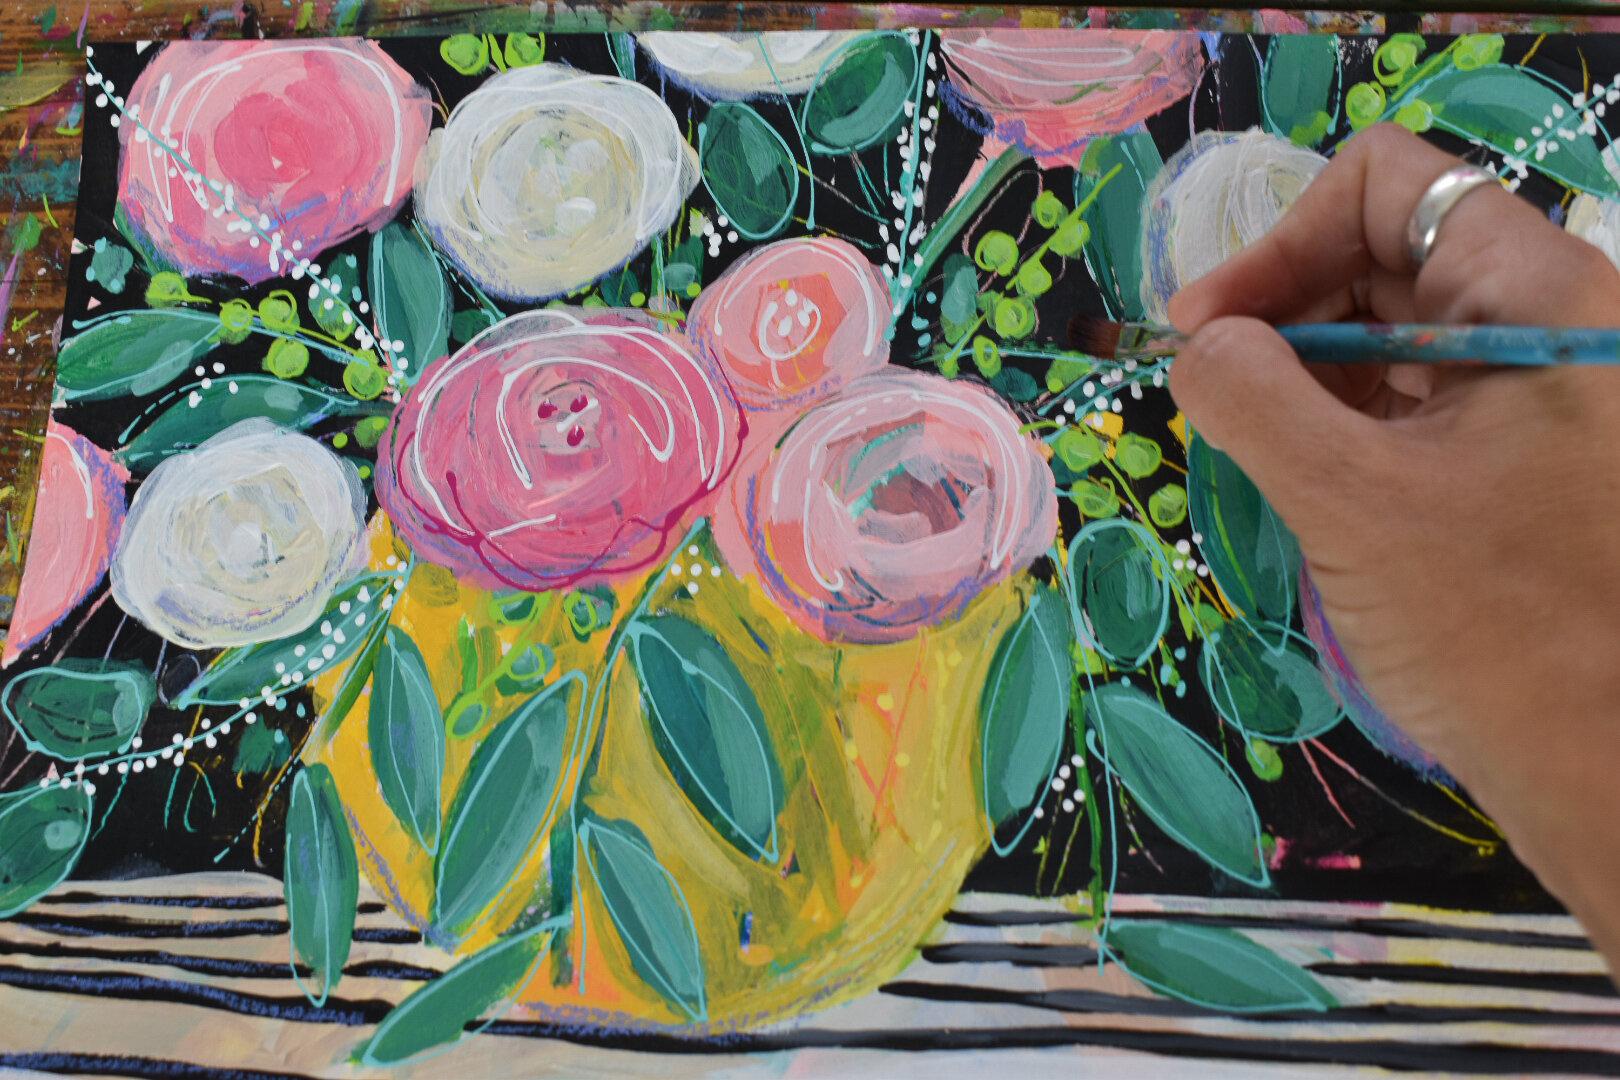 boho_eclectic_painting_art_stripes_daisyfaithart_pink_5.jpg